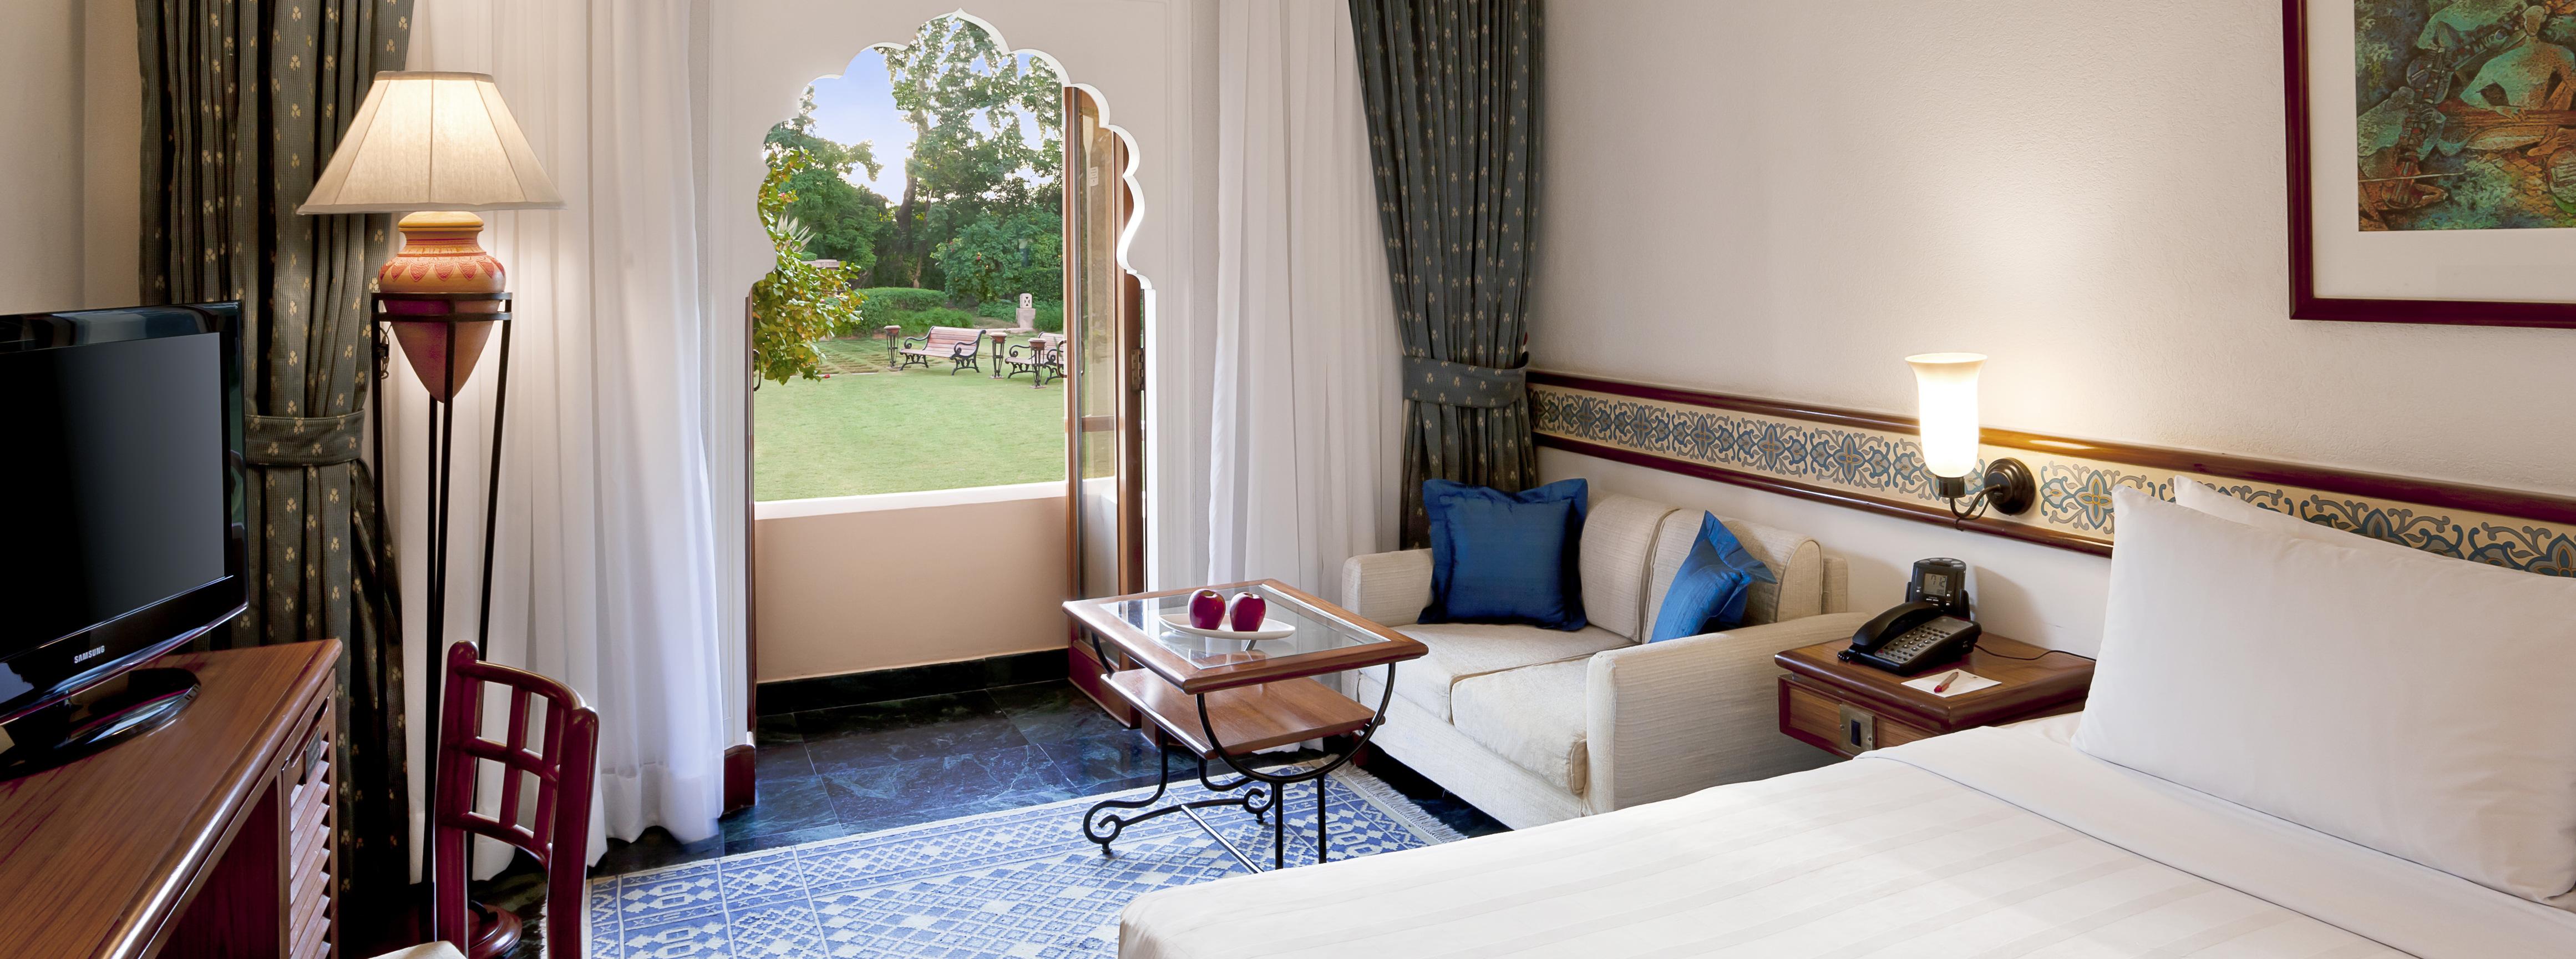 trident-hotel-jaipur-bedroom